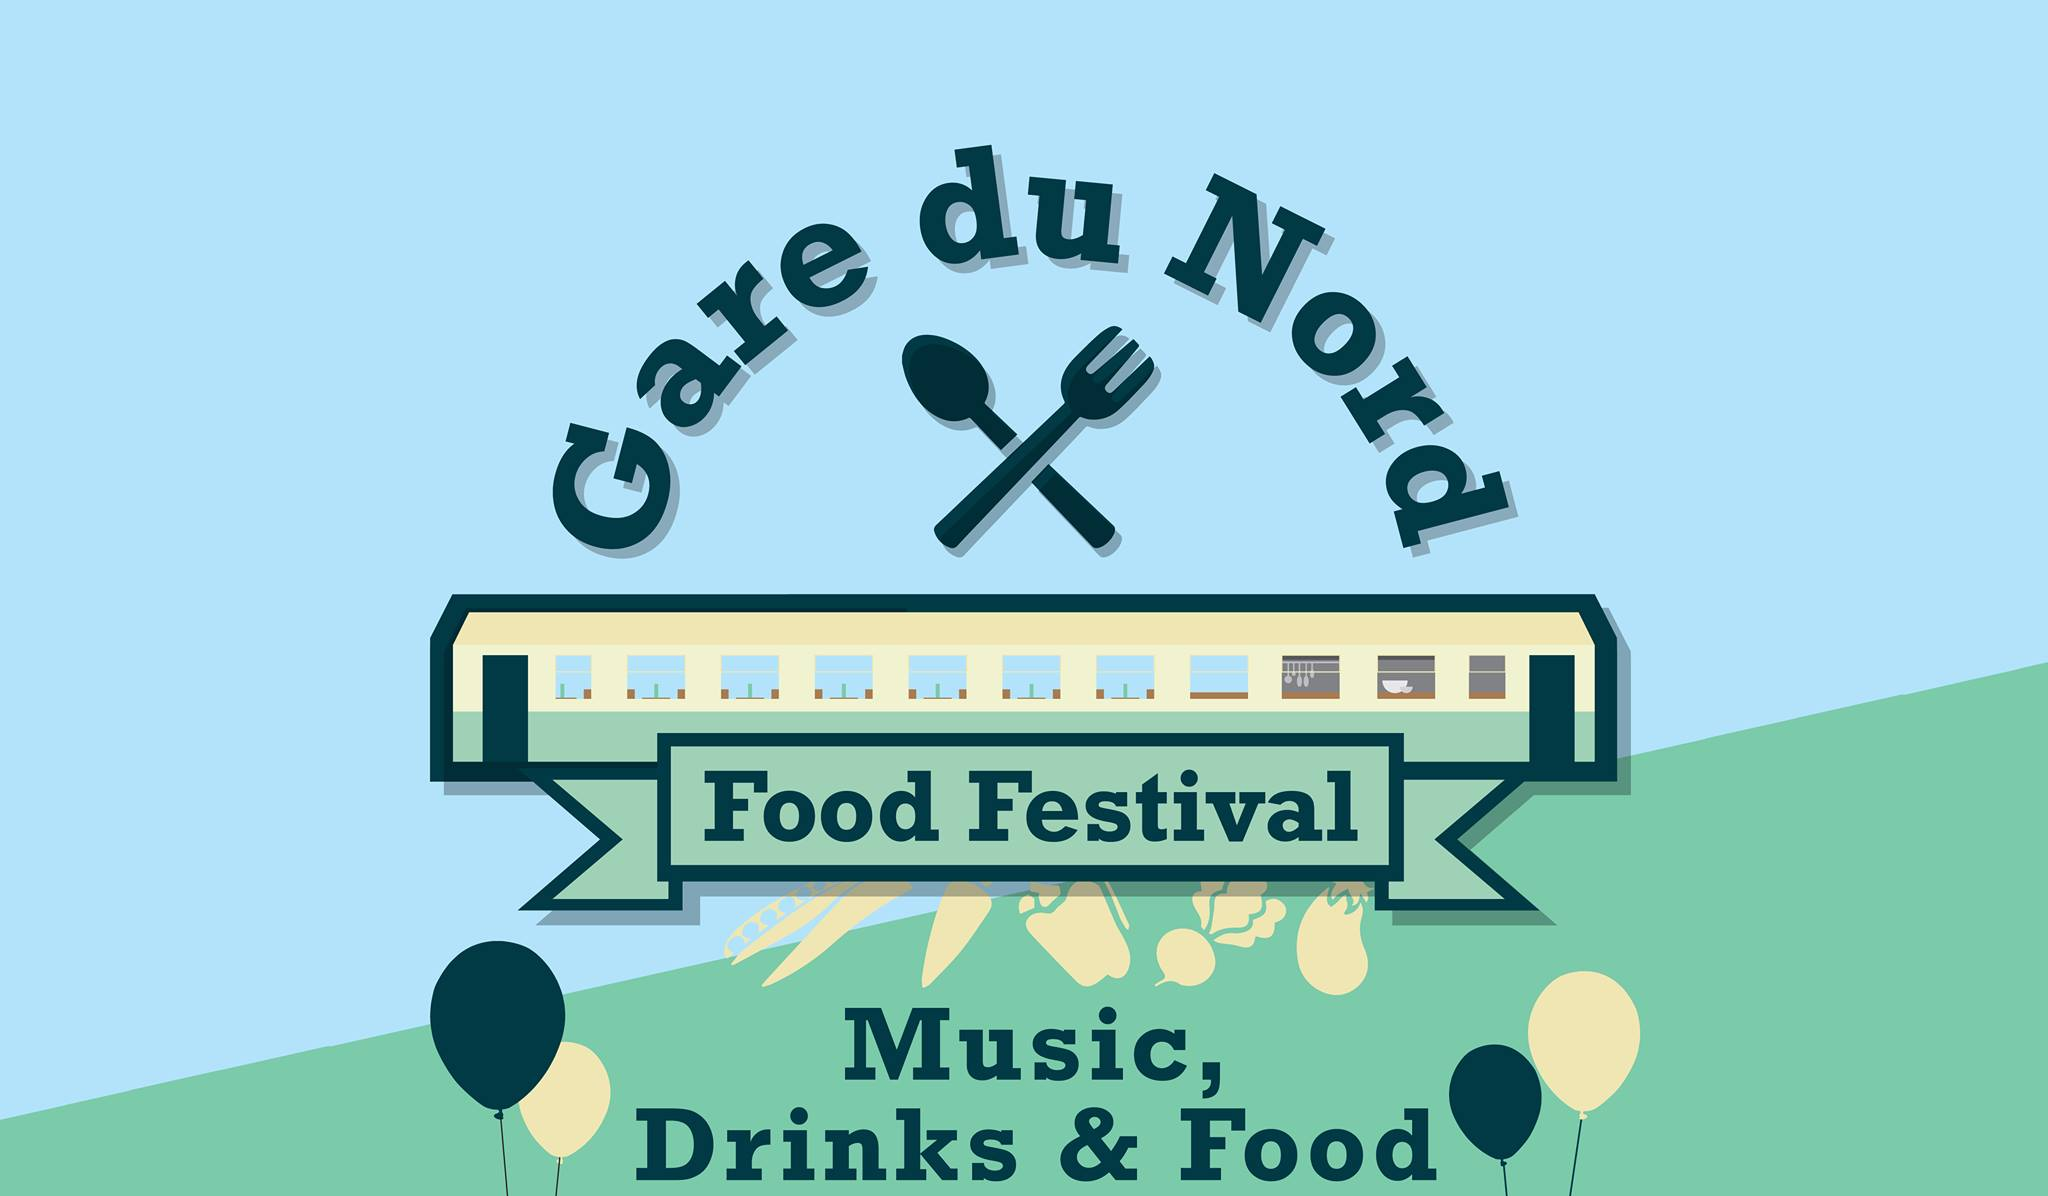 gare-du-nord-food-festival-2016